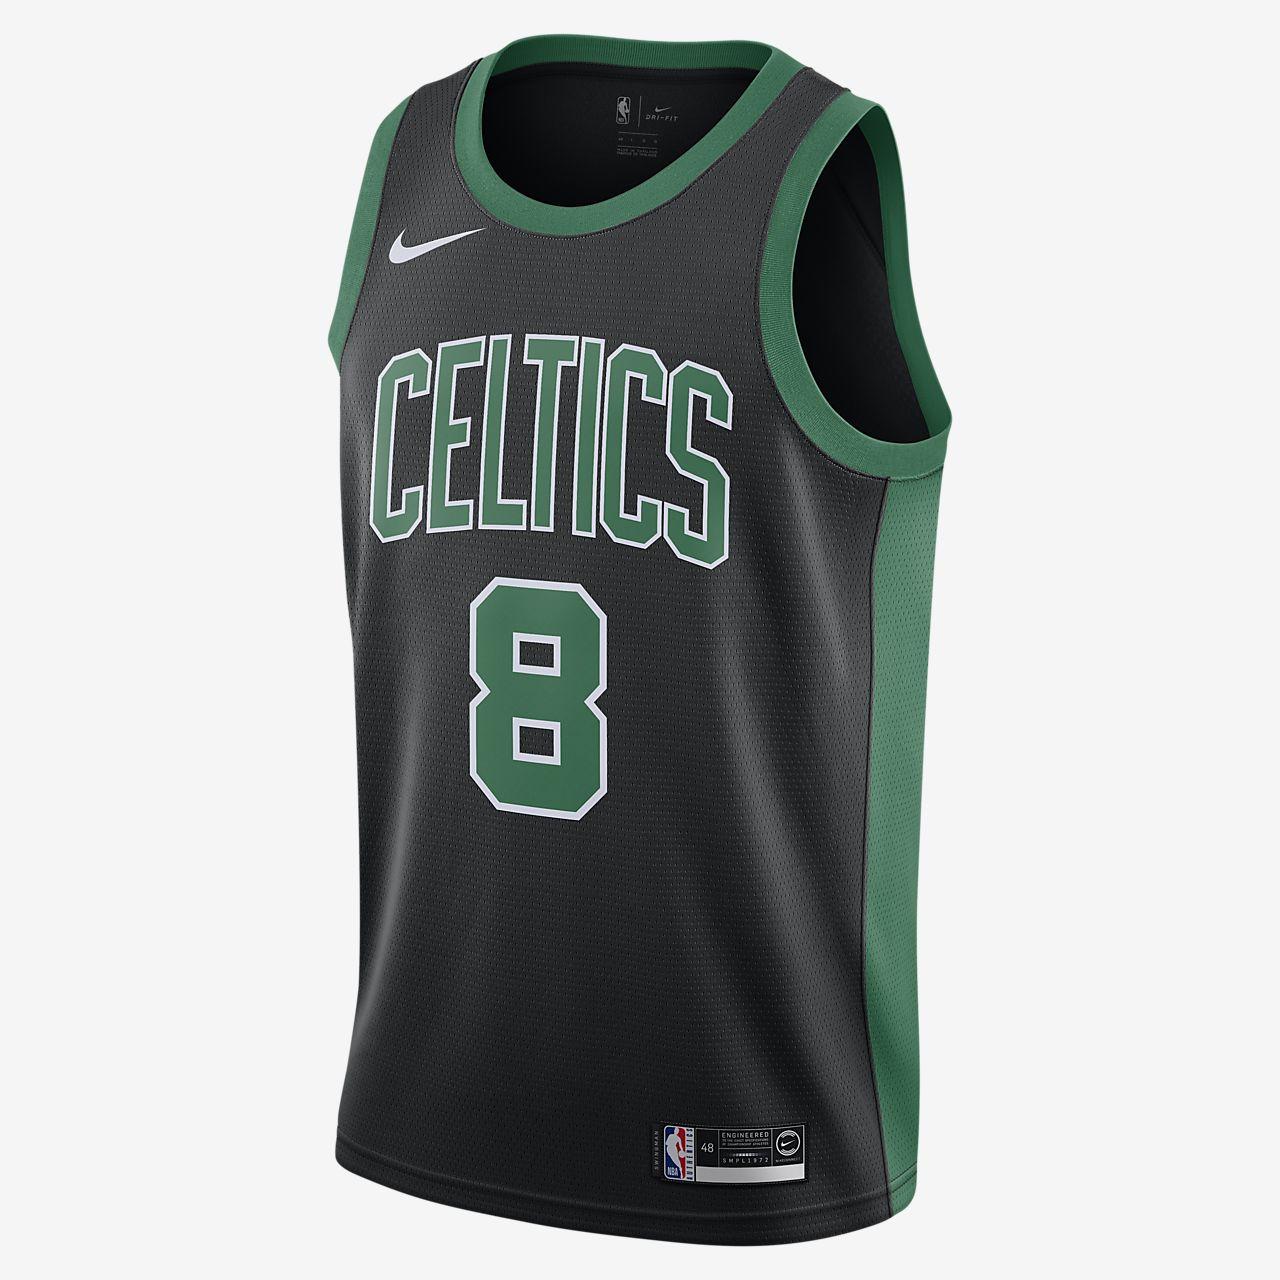 Camisola NBA da Nike Swingman Kemba Walker Celtics Statement Edition